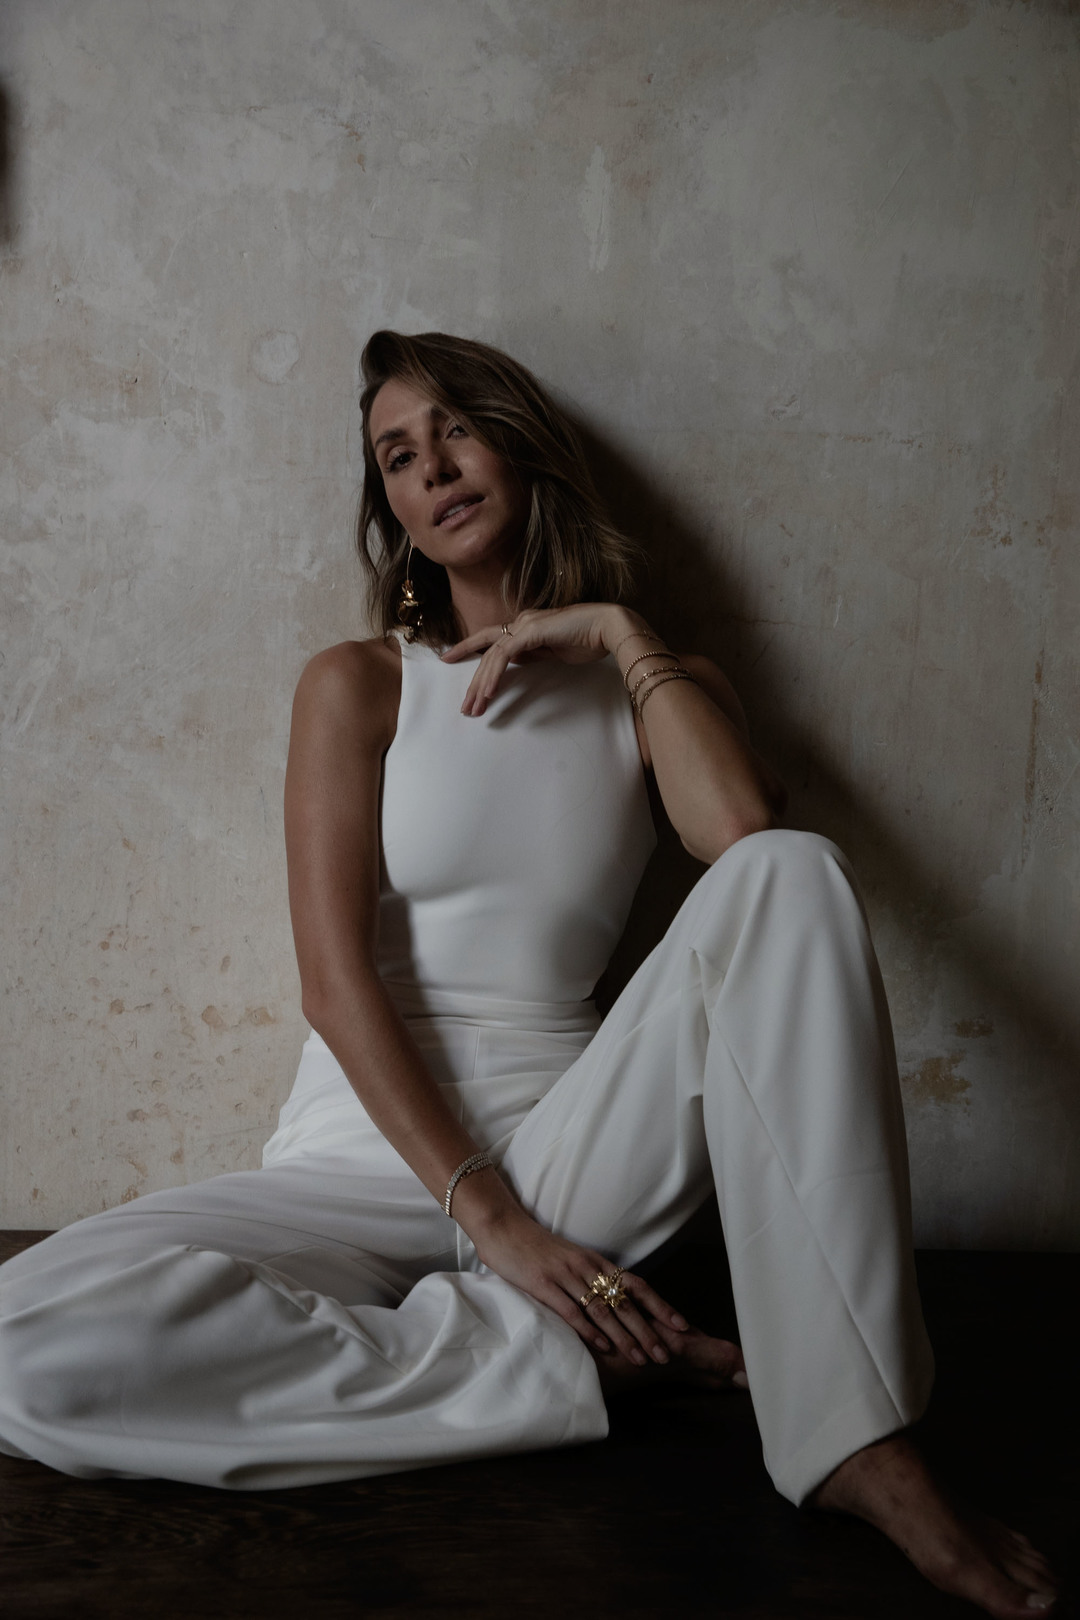 bardot jumpsuit dress photo